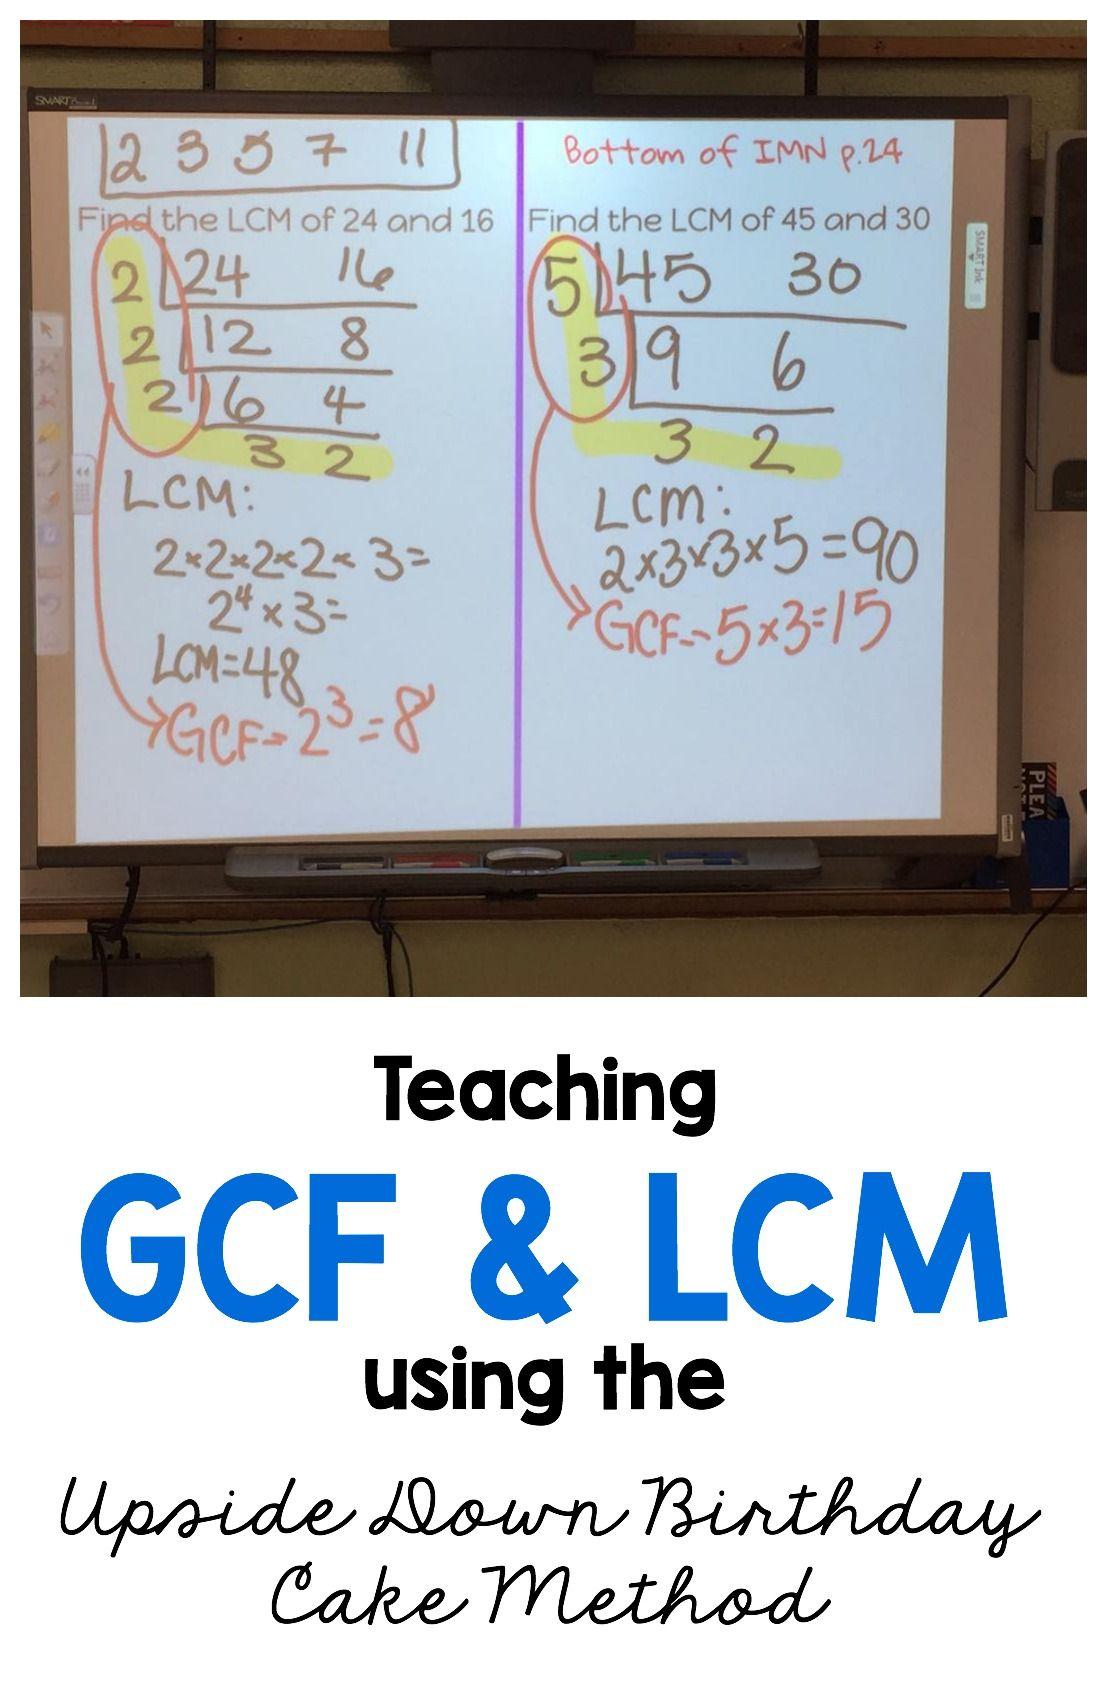 Gcf Lcm And Prime Factorization Using The Upside Down Birthday Cake Method Ladder Method Sixth Grade Math Prime Factorization Teaching Middle School Maths